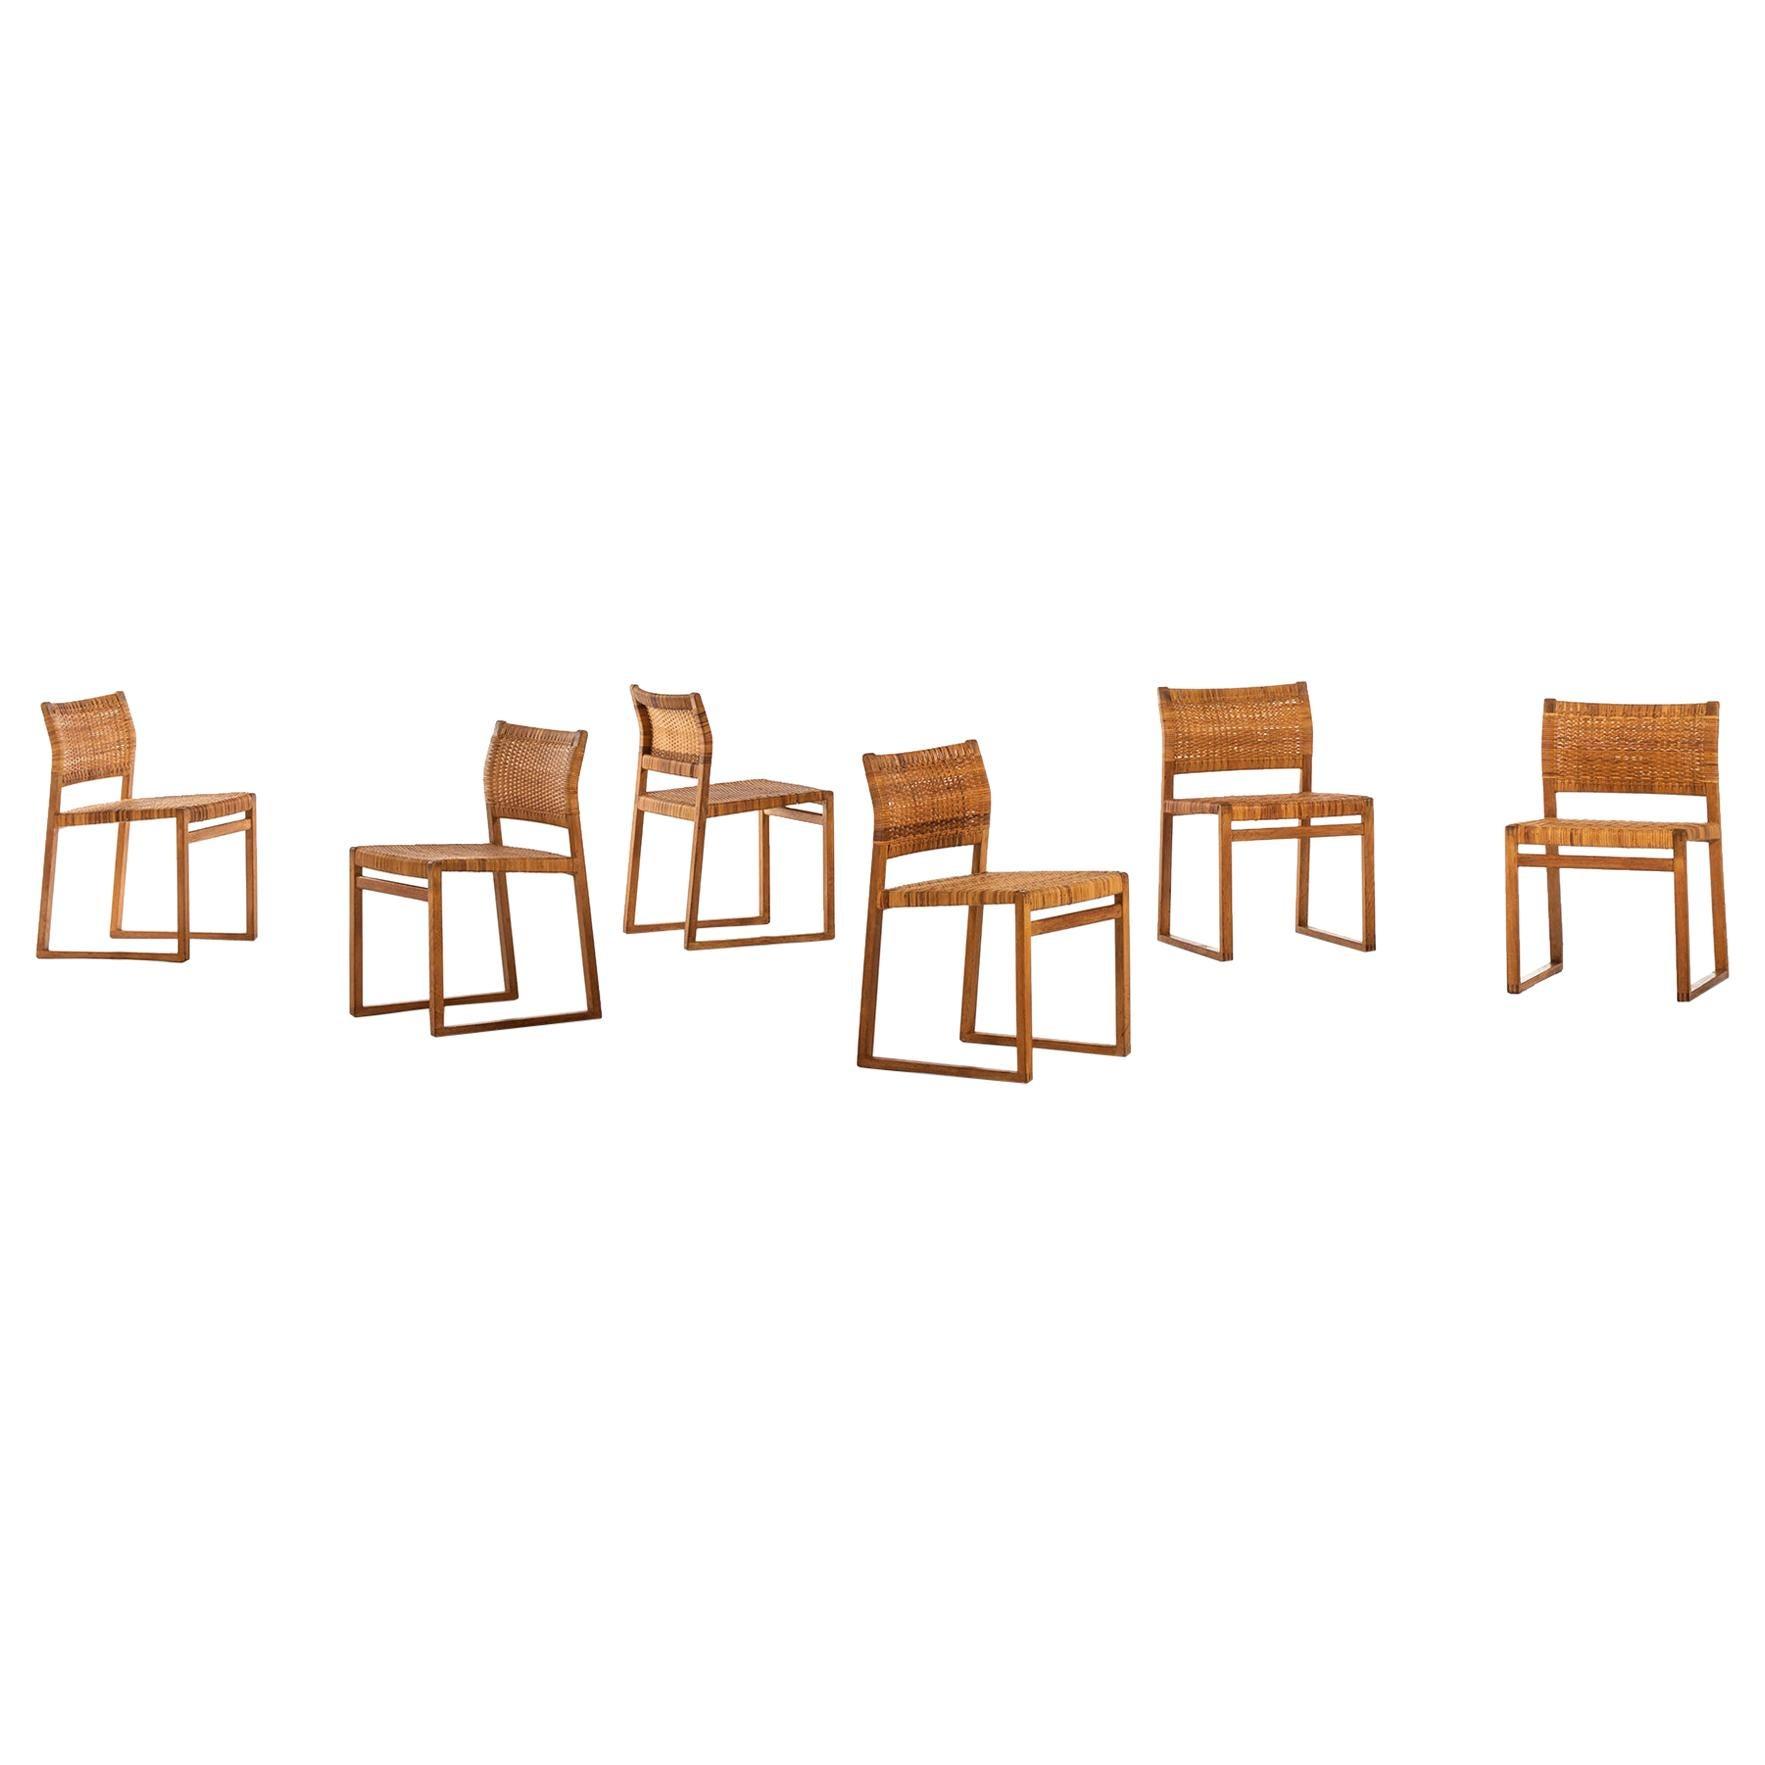 Børge Mogensen Dining Chairs Model Bm-61 by Fredericia Stolefabrik in Denmark